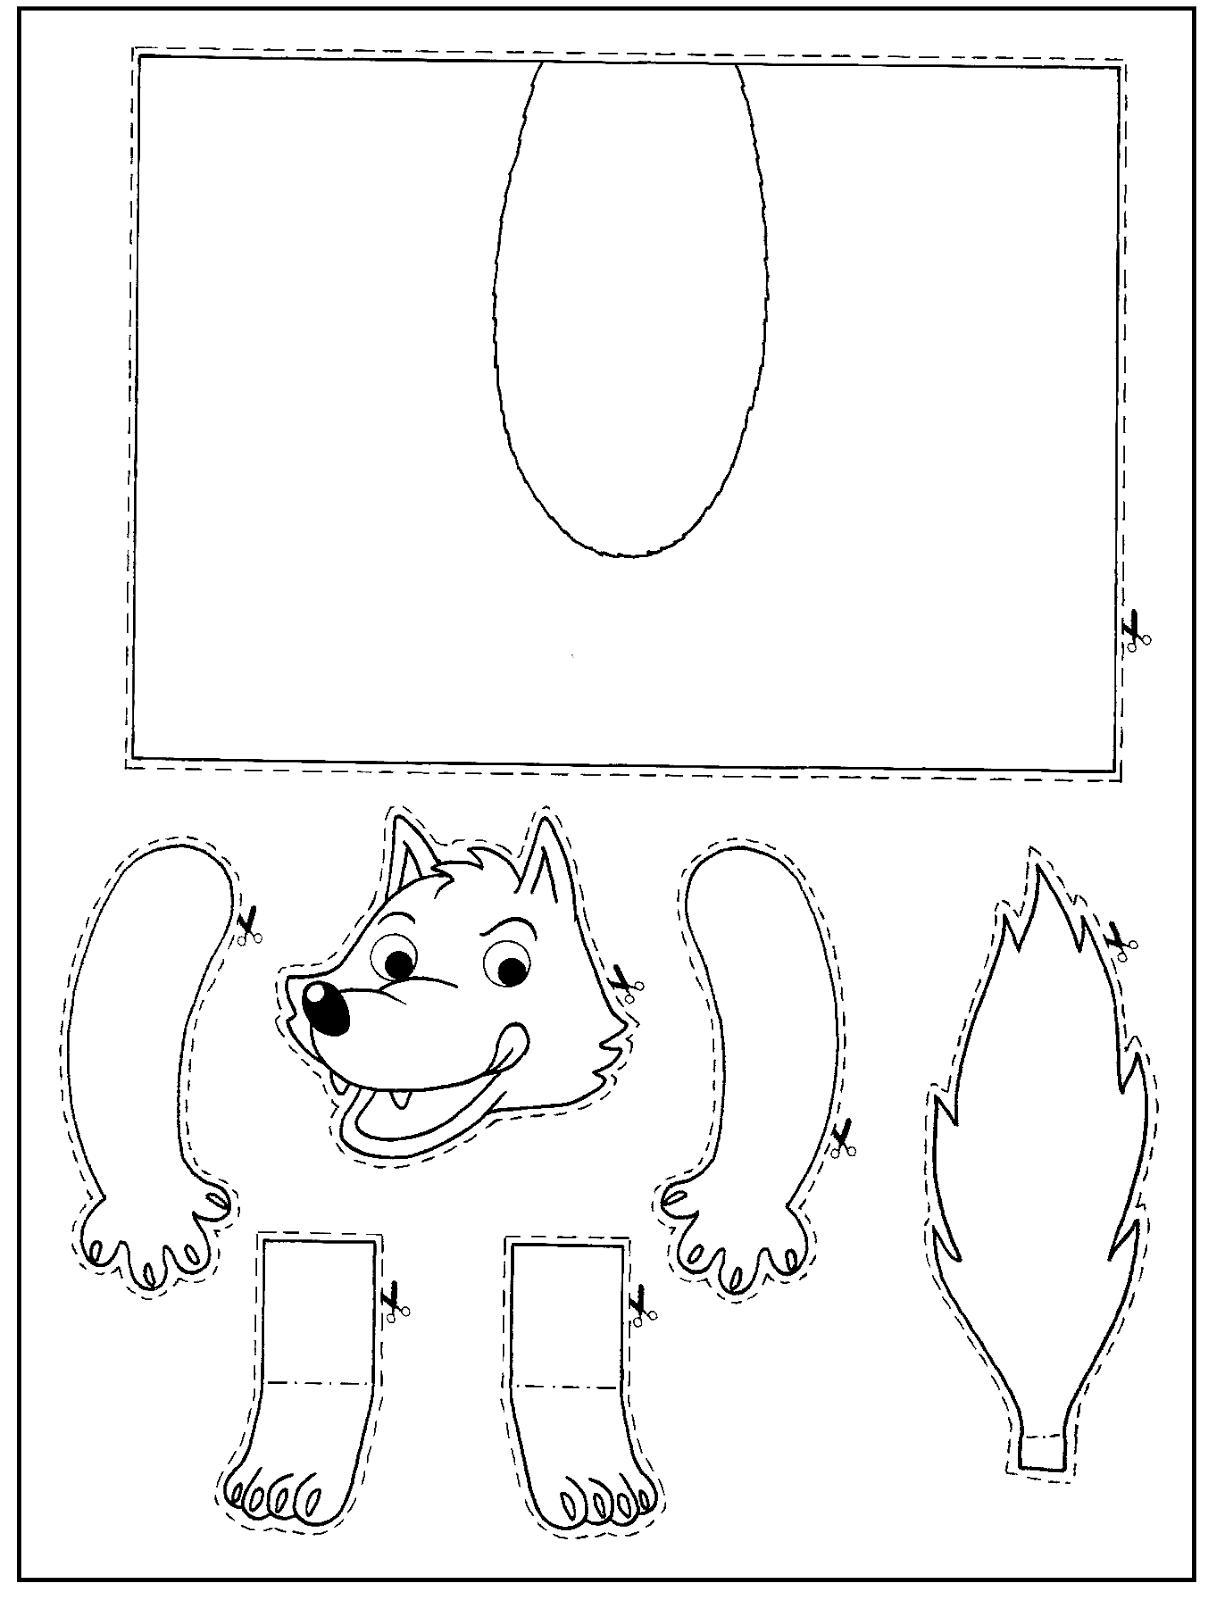 Lobo.png (1225×1600) | cumples | Pinterest | Wolf, Aula y Cerdo